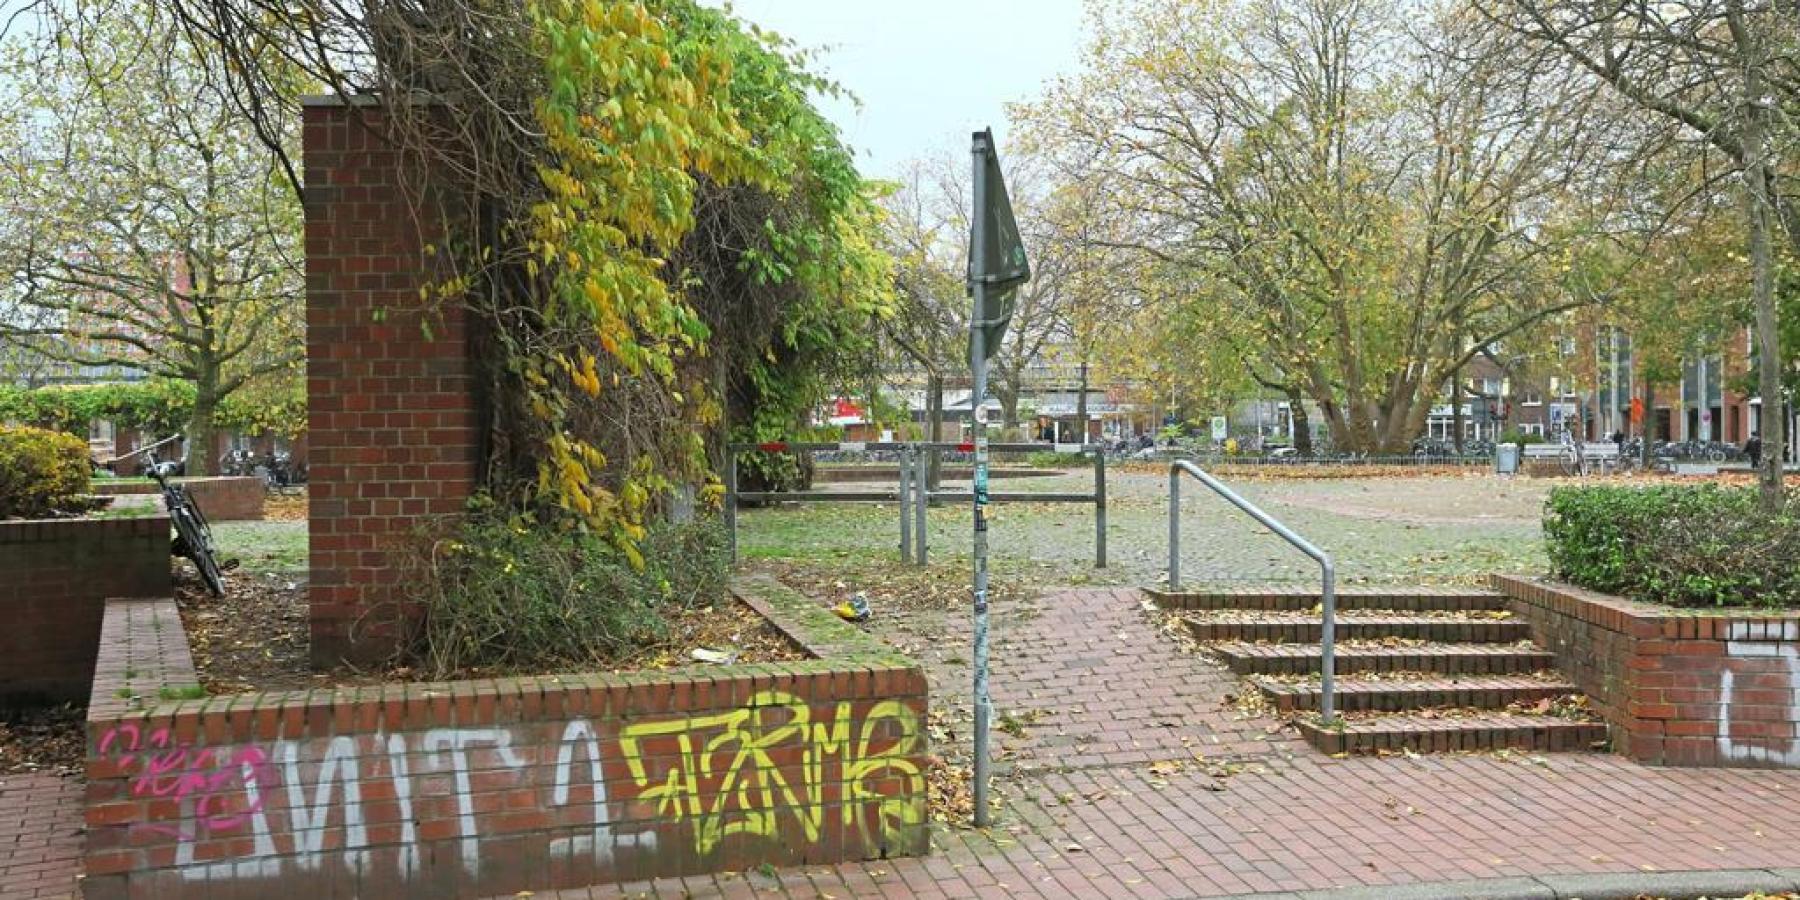 Planungswerkstätten zur Grünfläche des Bremer Platzes